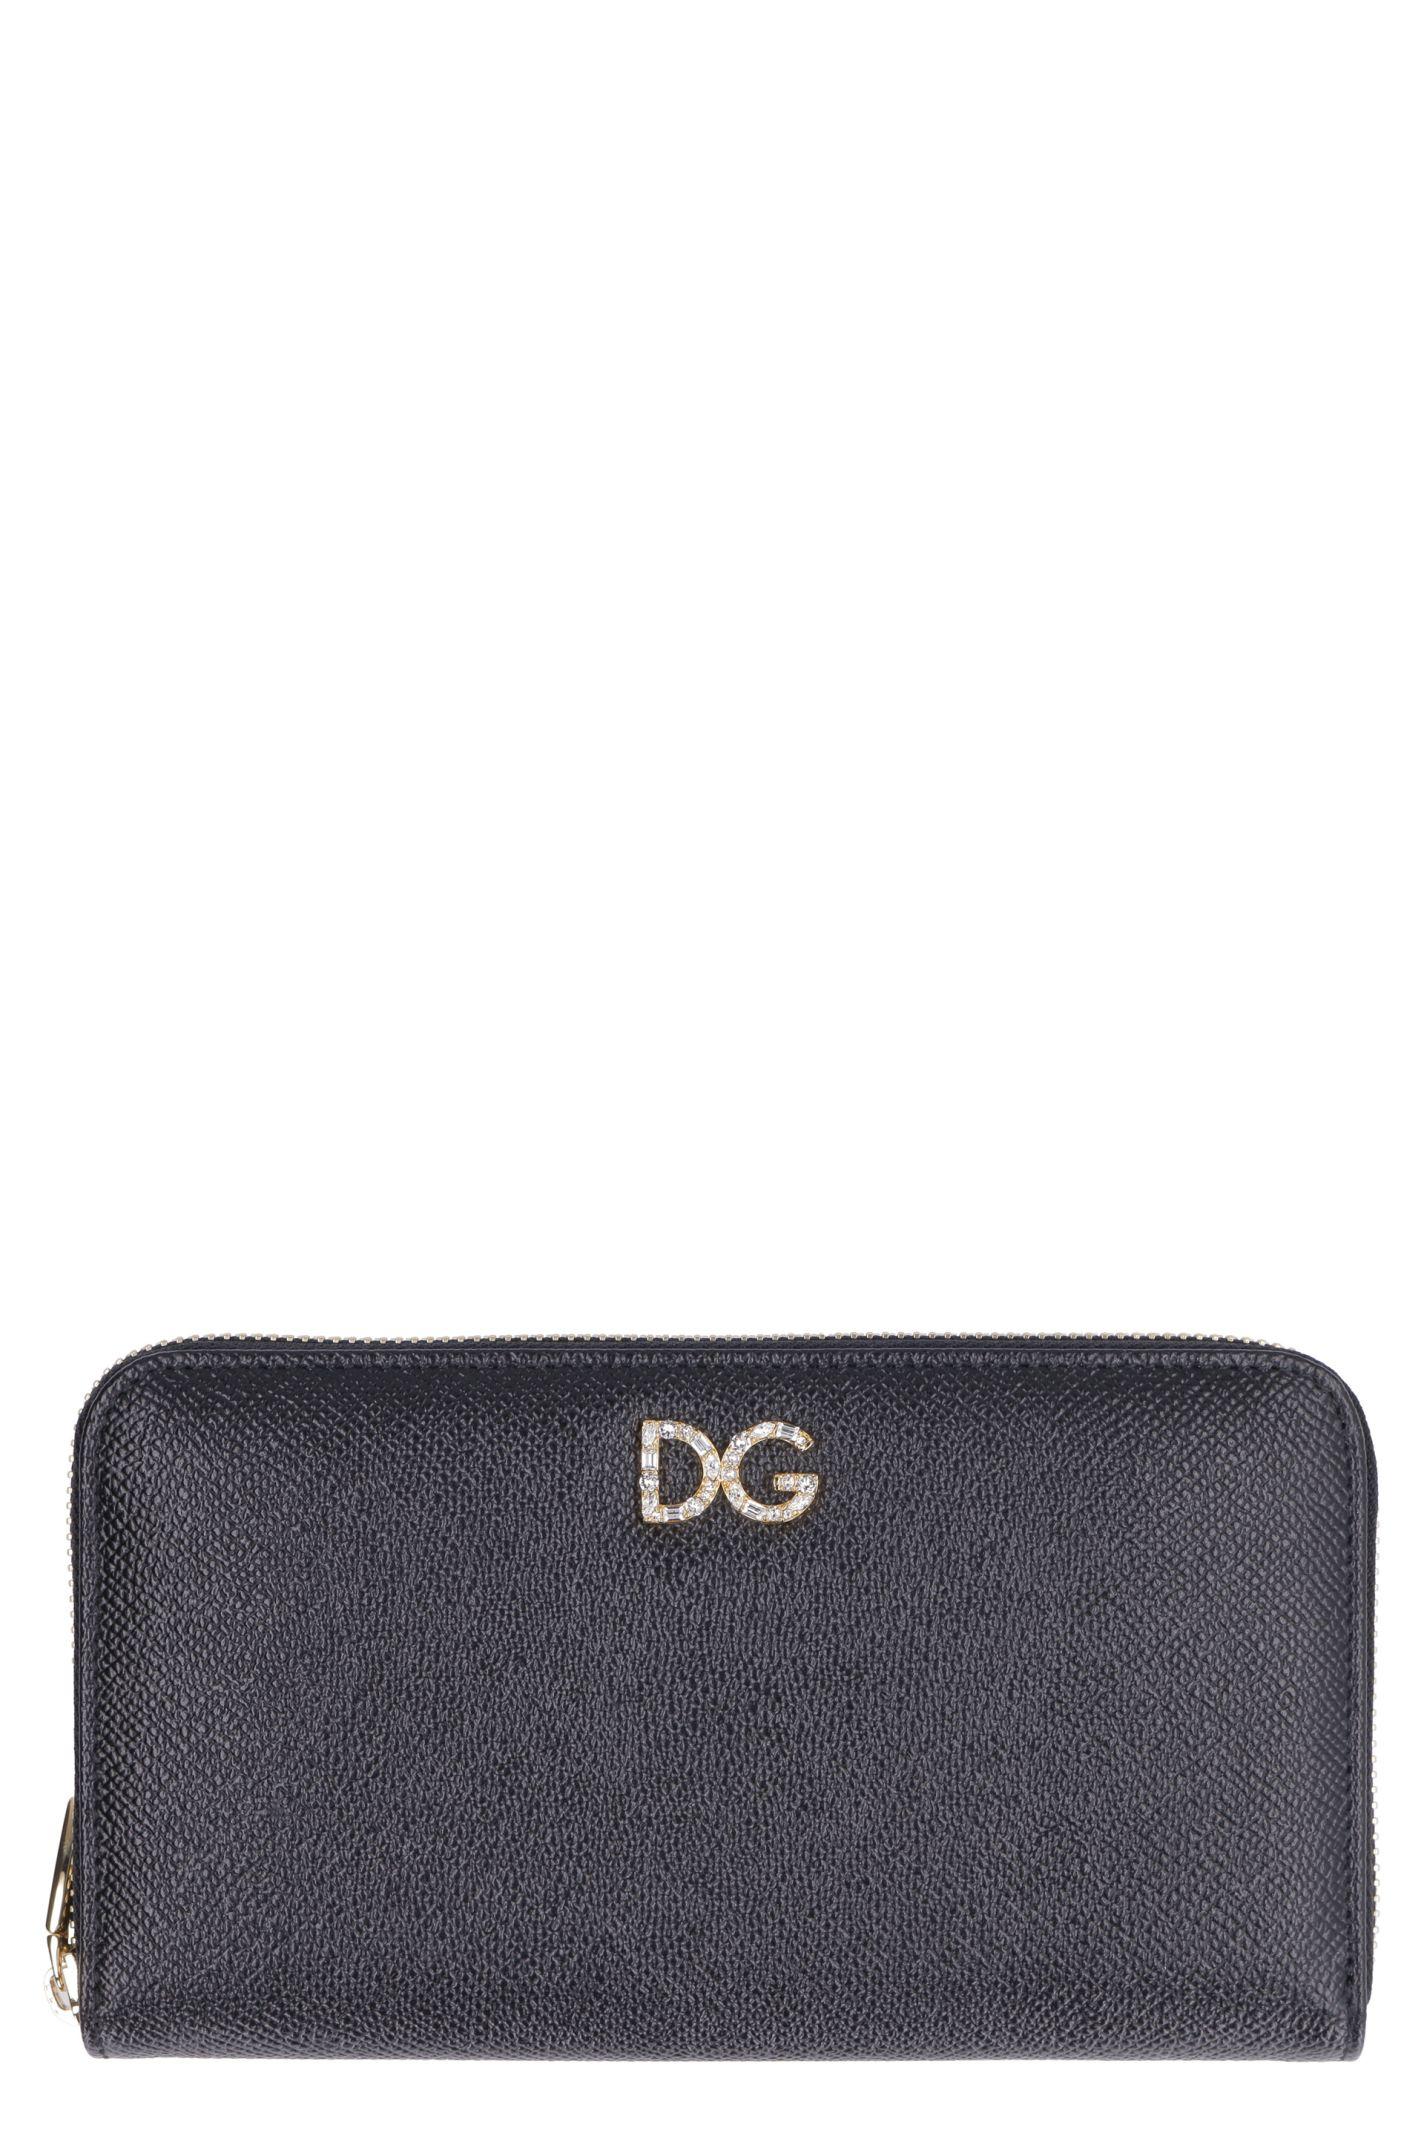 6e161f61bd Dolce & Gabbana Dolce & Gabbana Dauphine Leather Print Zip Around ...